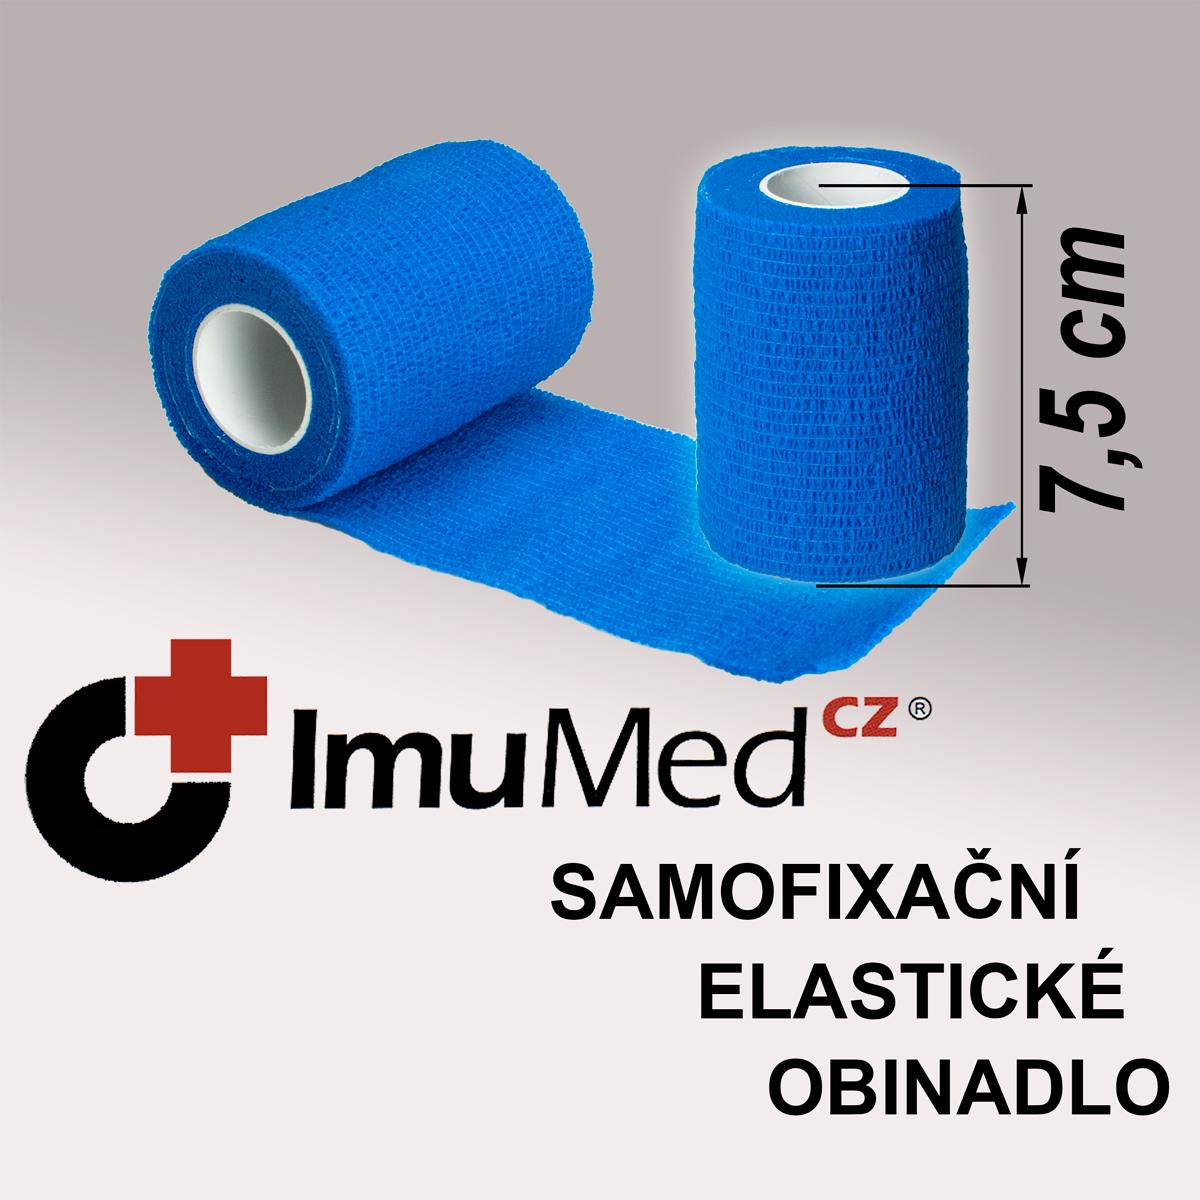 ImuMedCZ samofixační elastické obinadlo 7,5 cm x 4,5 m MODRÁ ImuMedCZ samodržící elastické obinadlo 7,5 cm x 4,5 m MODRÁ